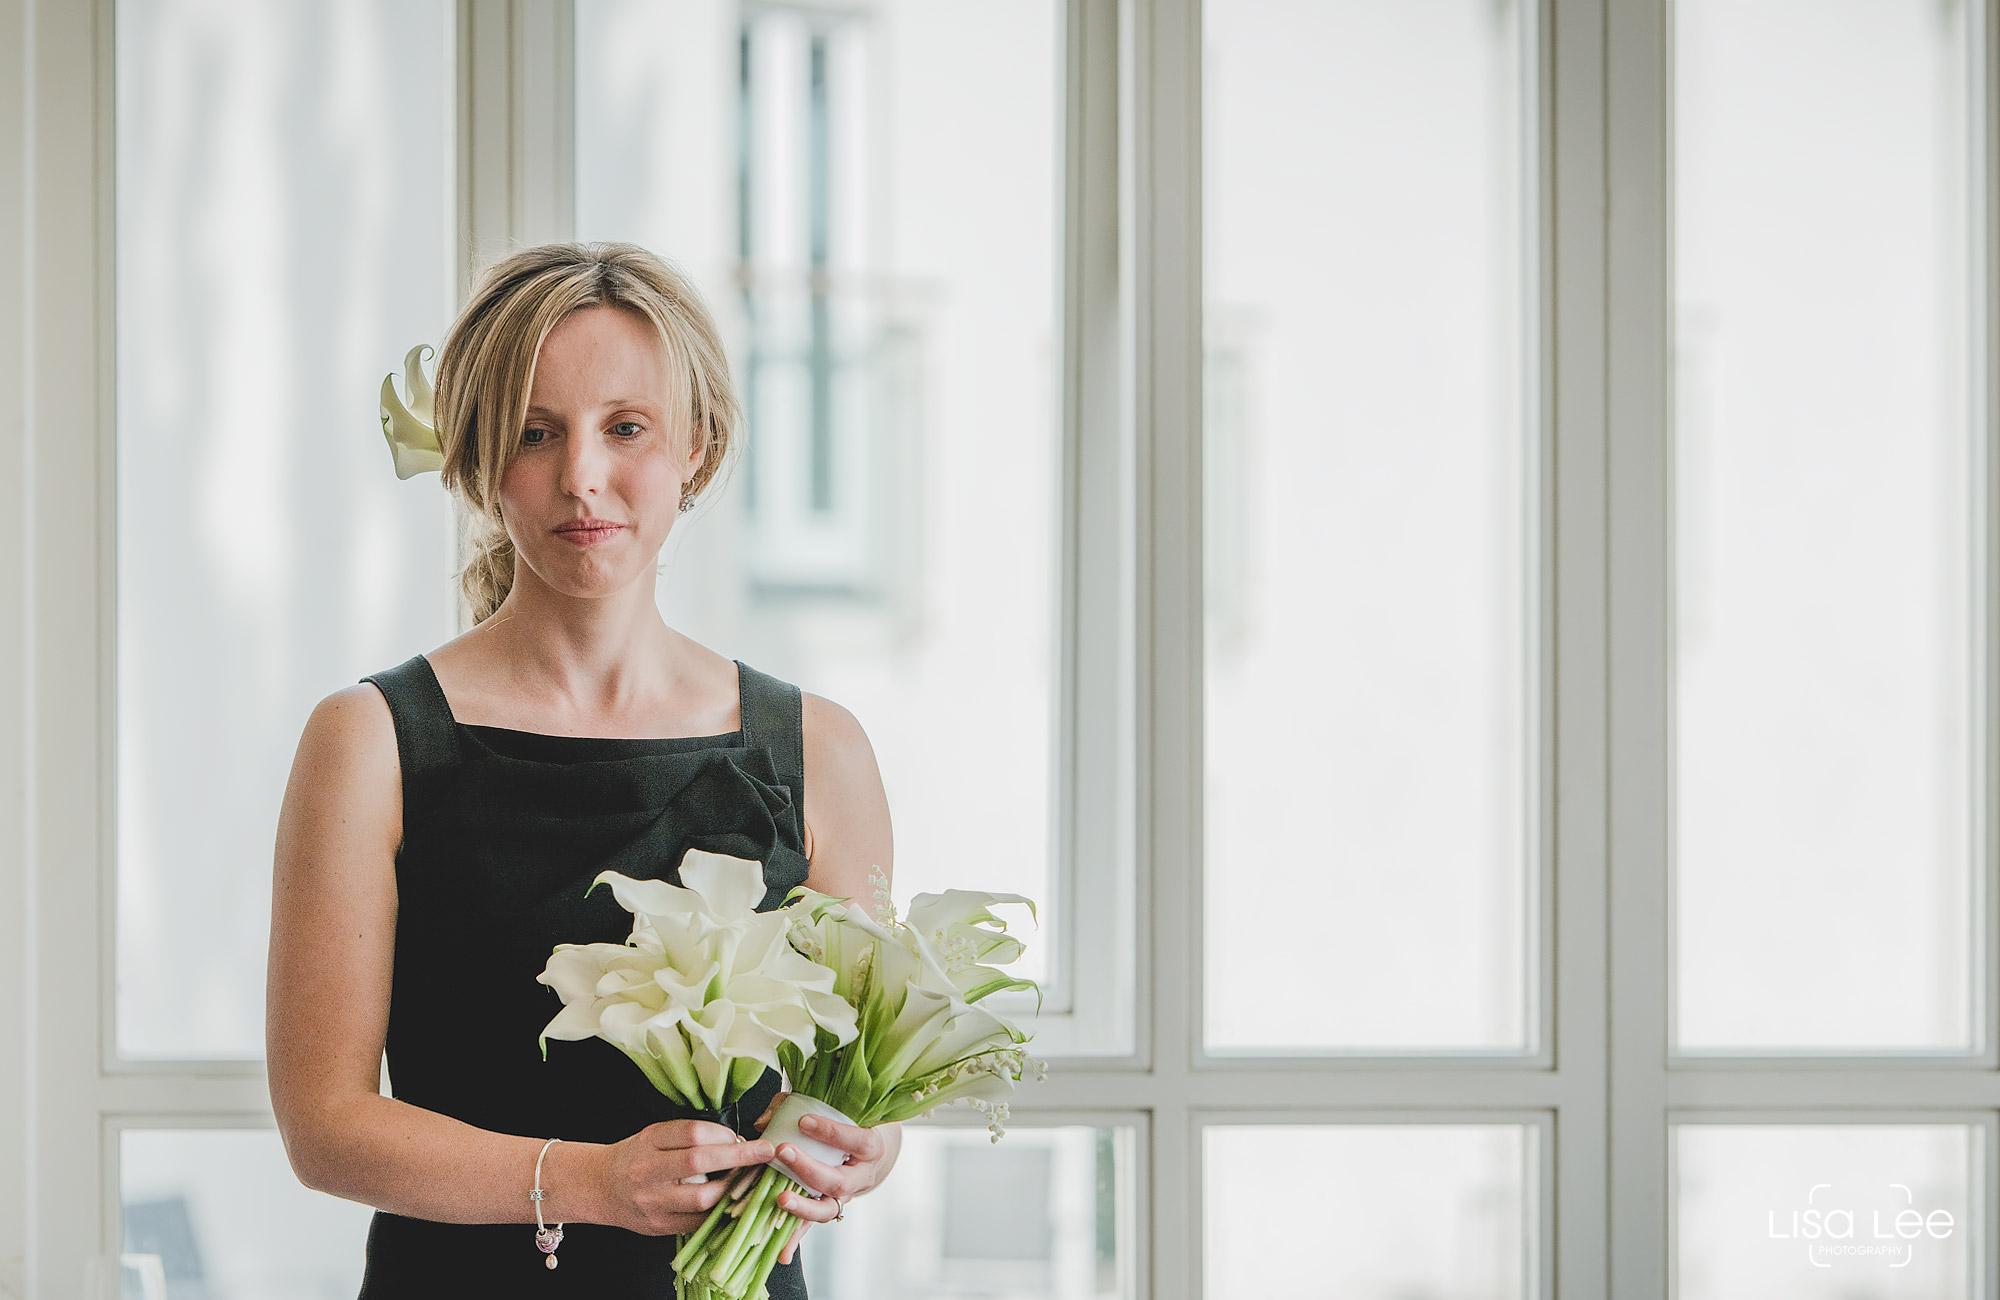 lisa-lee-wedding-photography-christchurch-dorset-bridesmaid.jpg